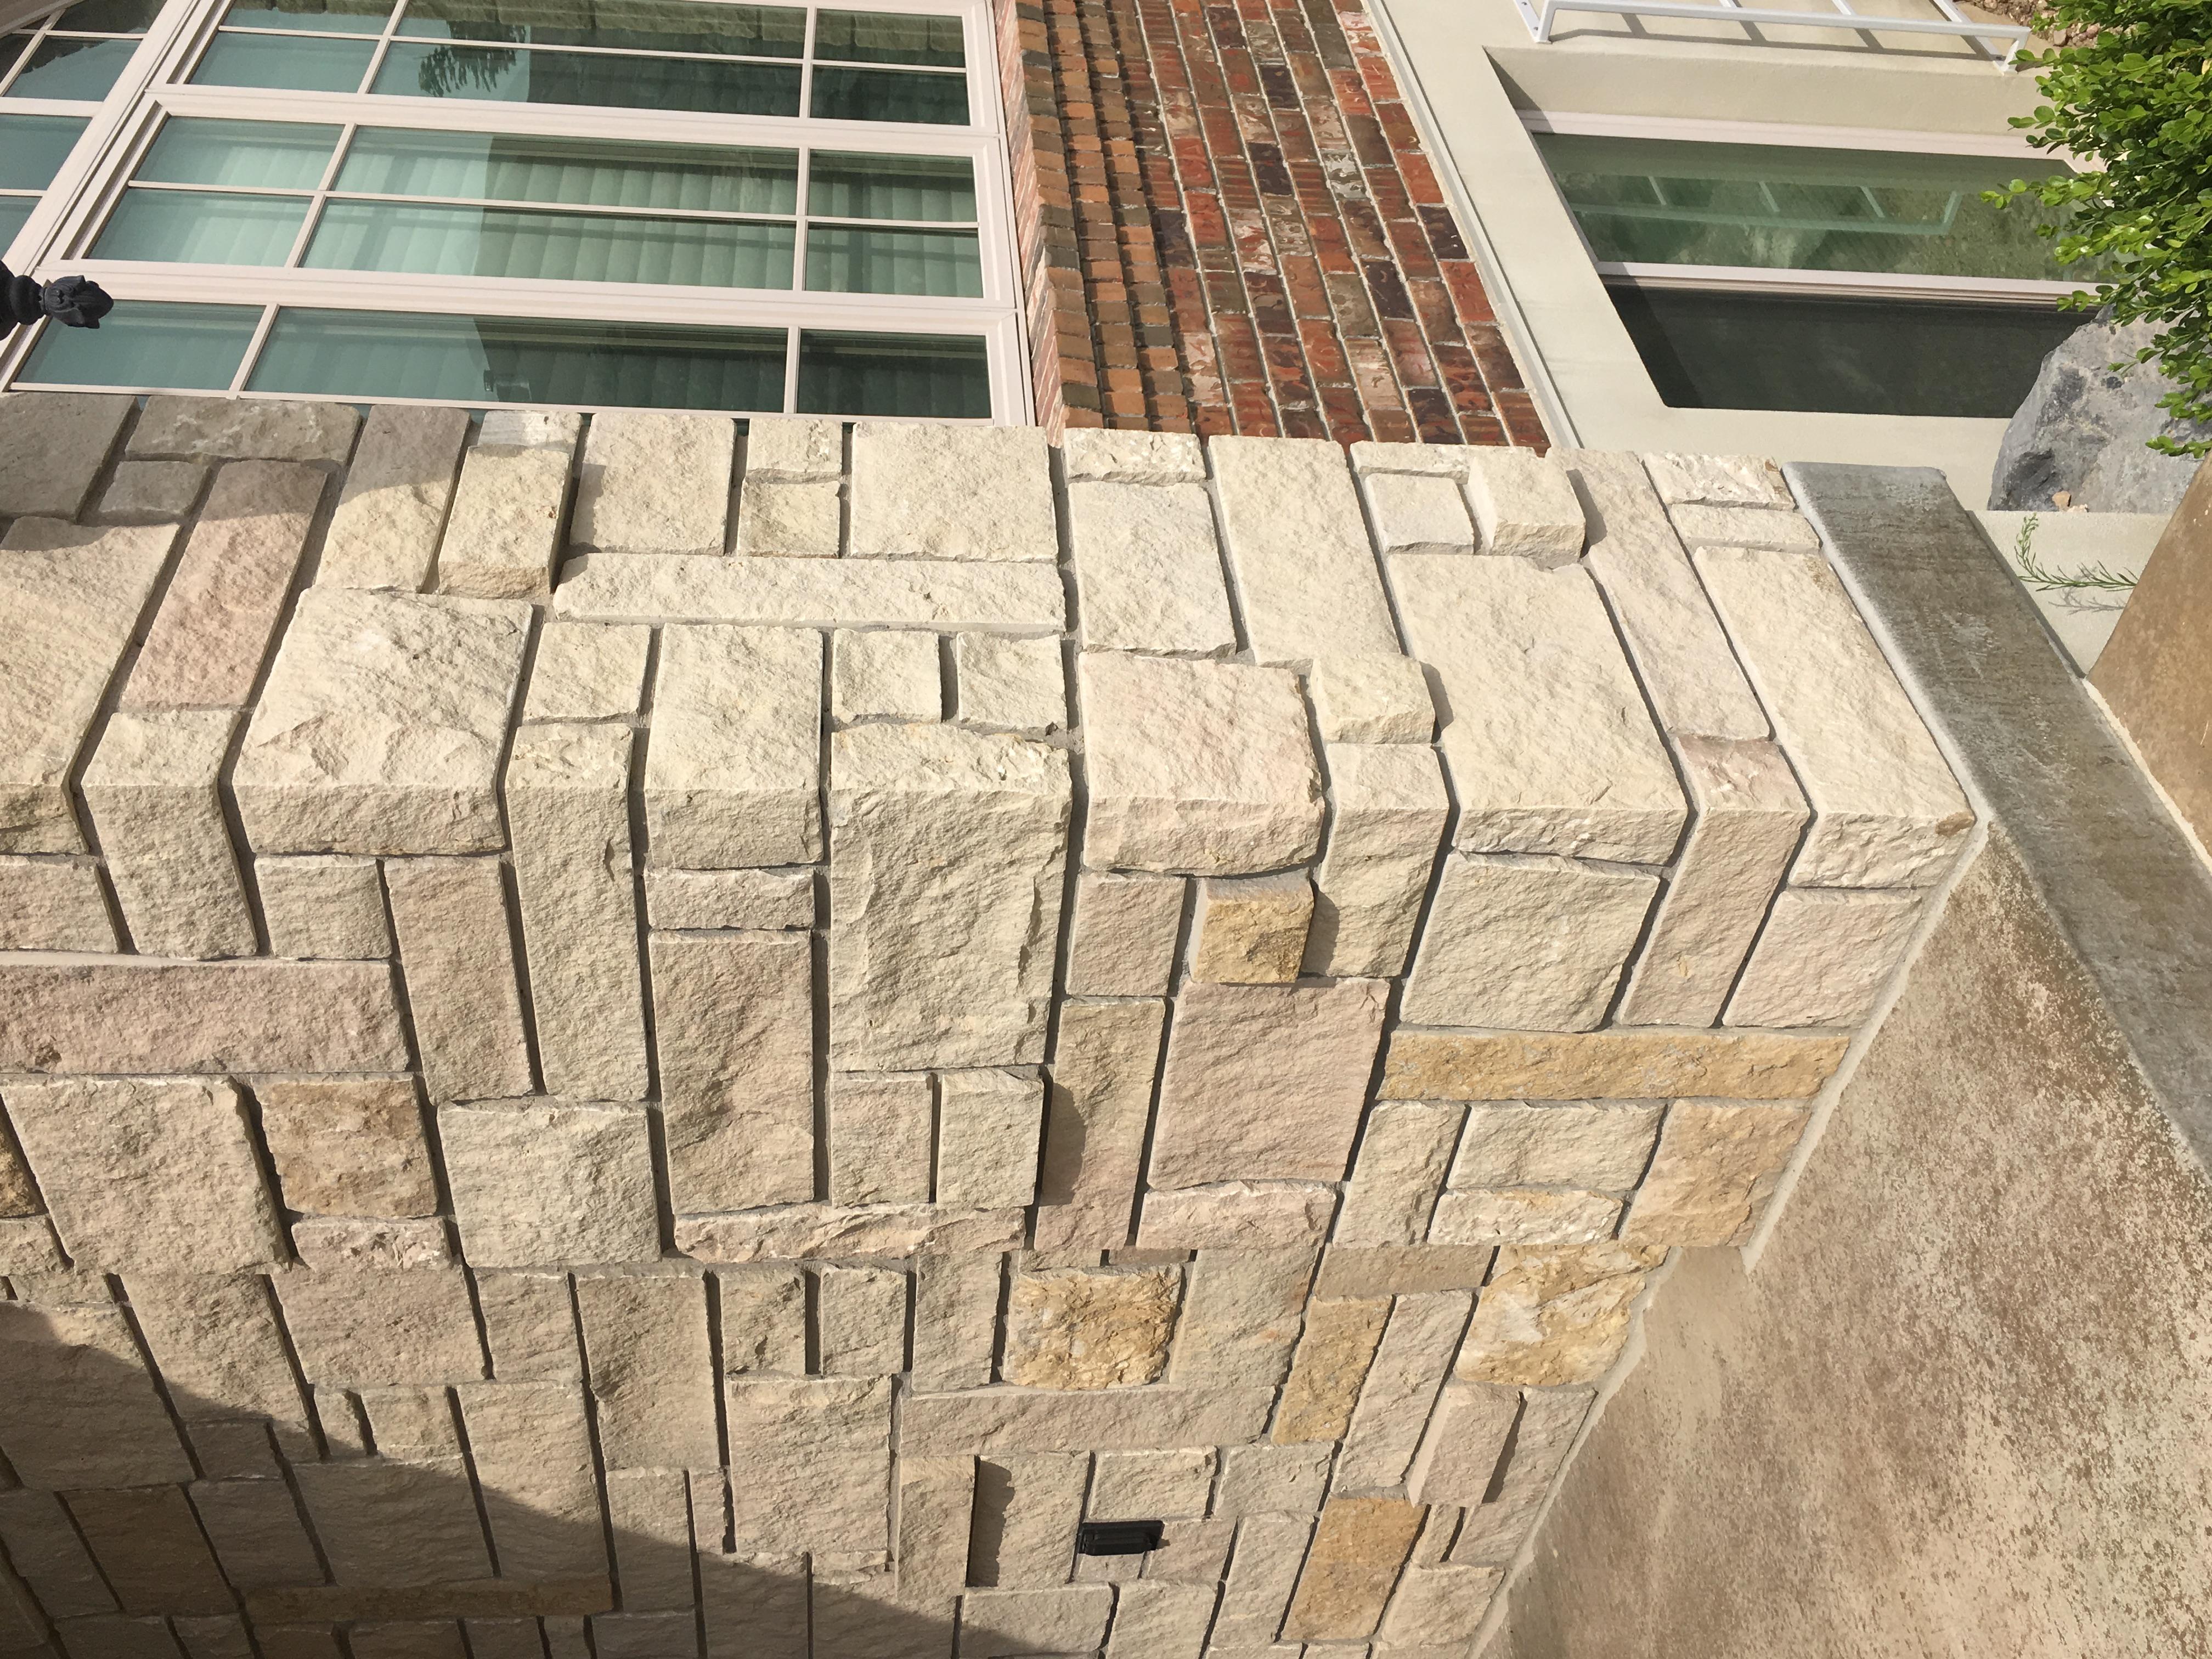 Leuders Cream Limestone and Masonry1